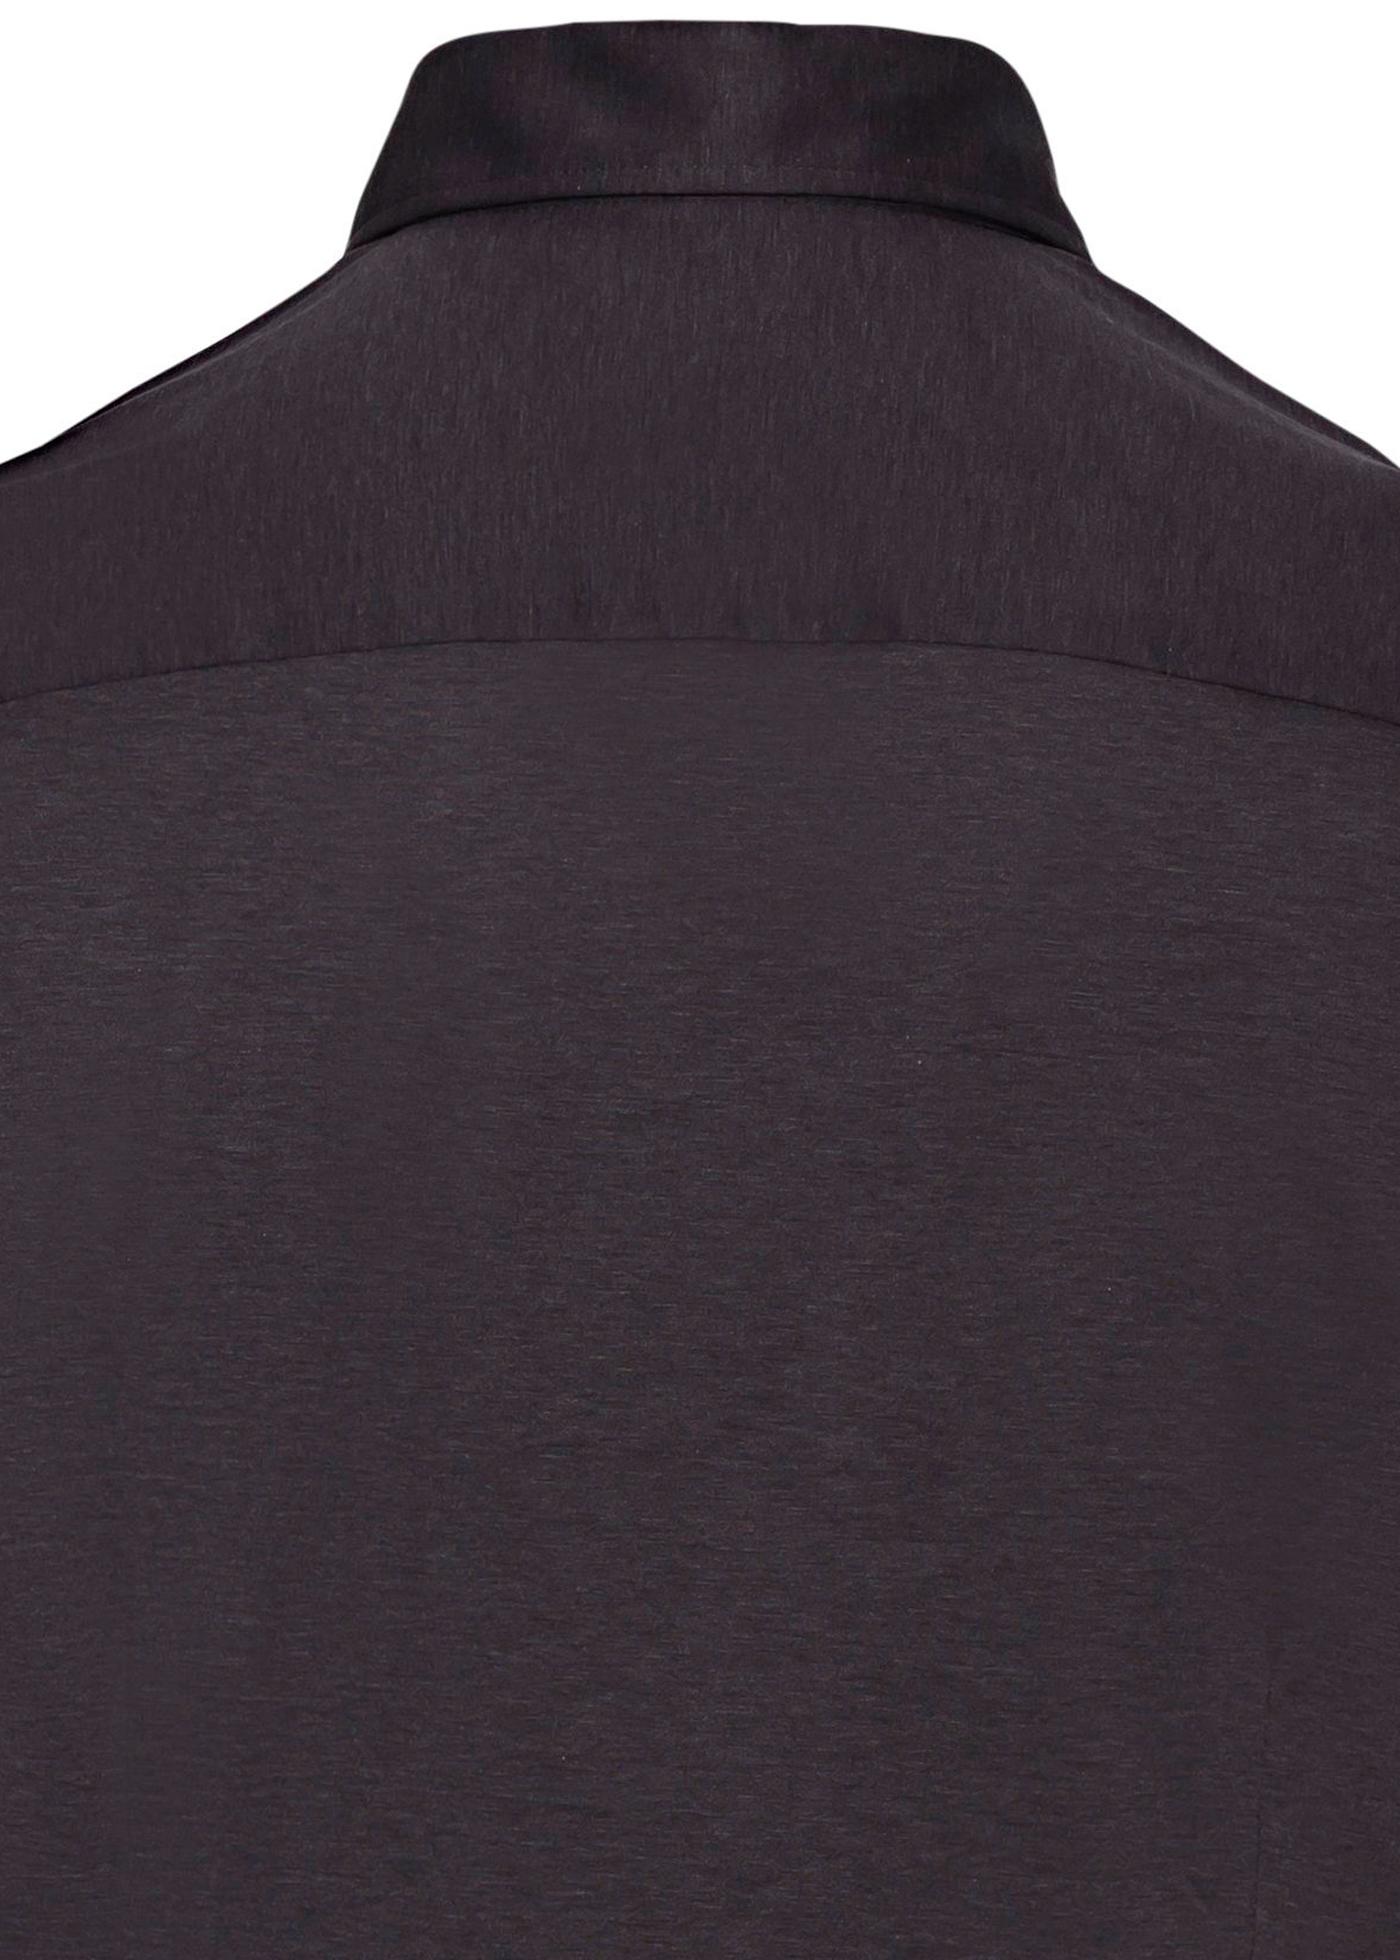 Jersey shirt image number 3